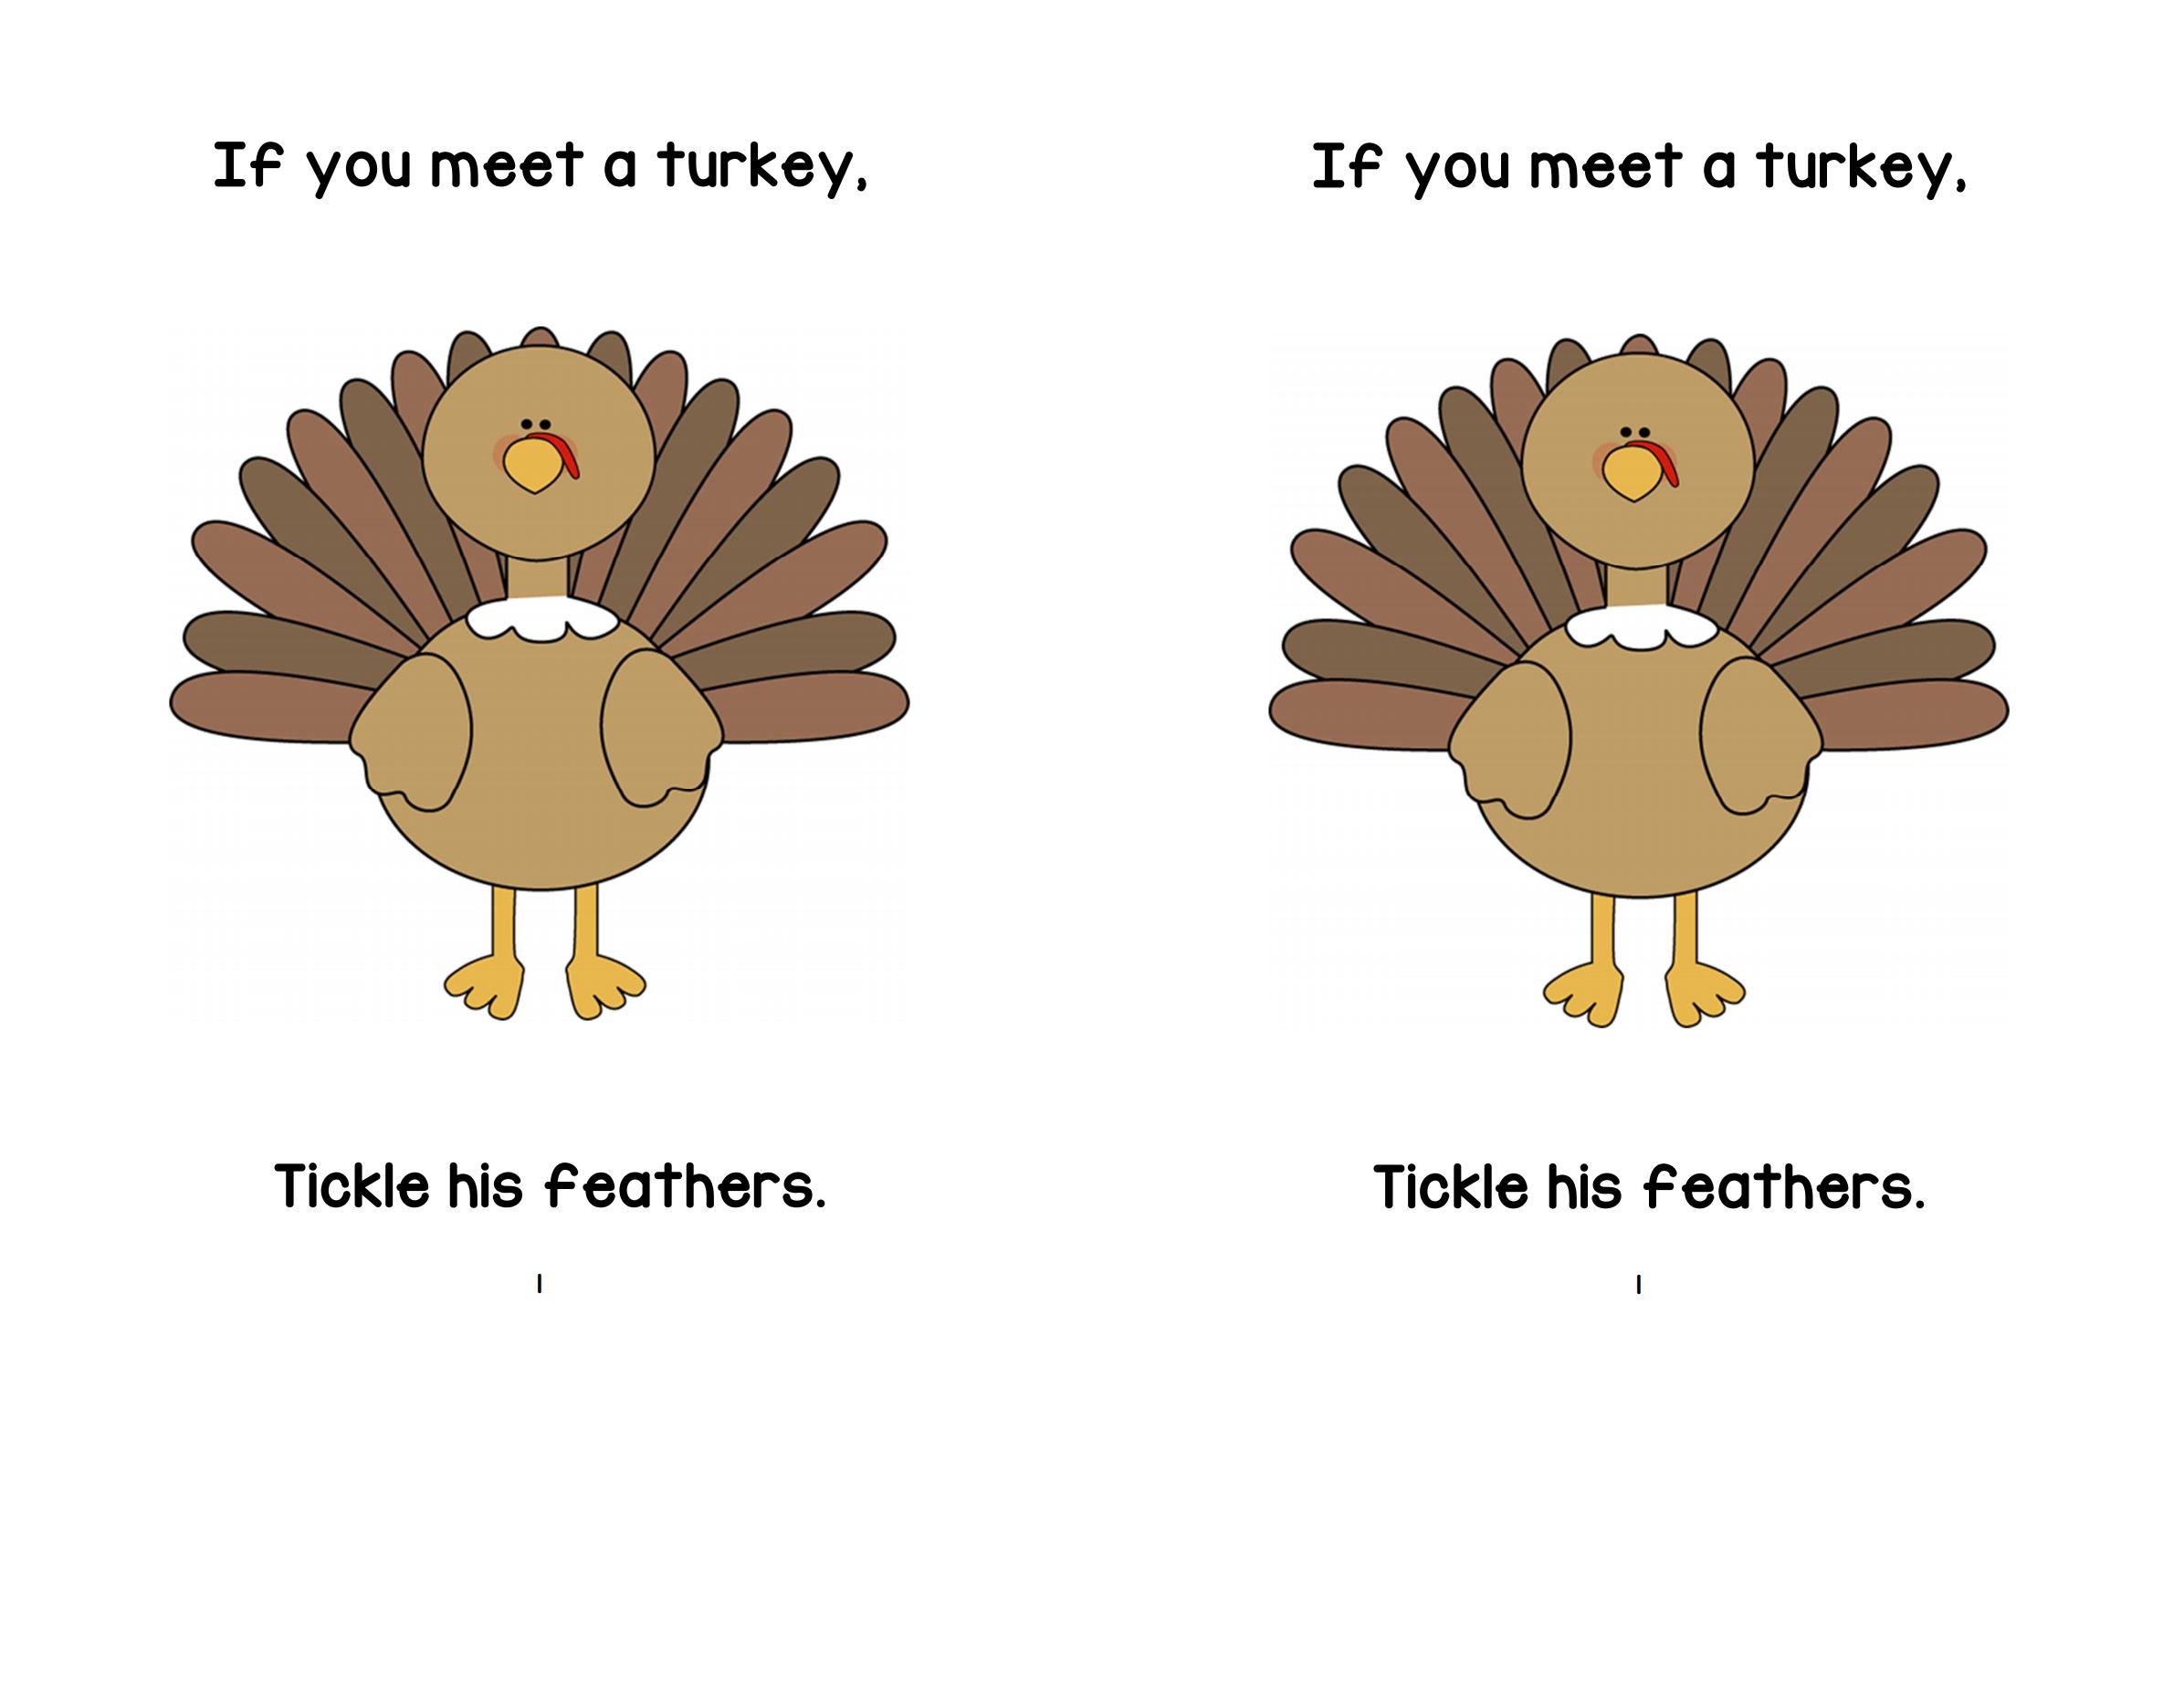 If You Meet A Turkey Printable Book   A To Z Teacher Stuff Printable - Thanksgiving Printable Books Free